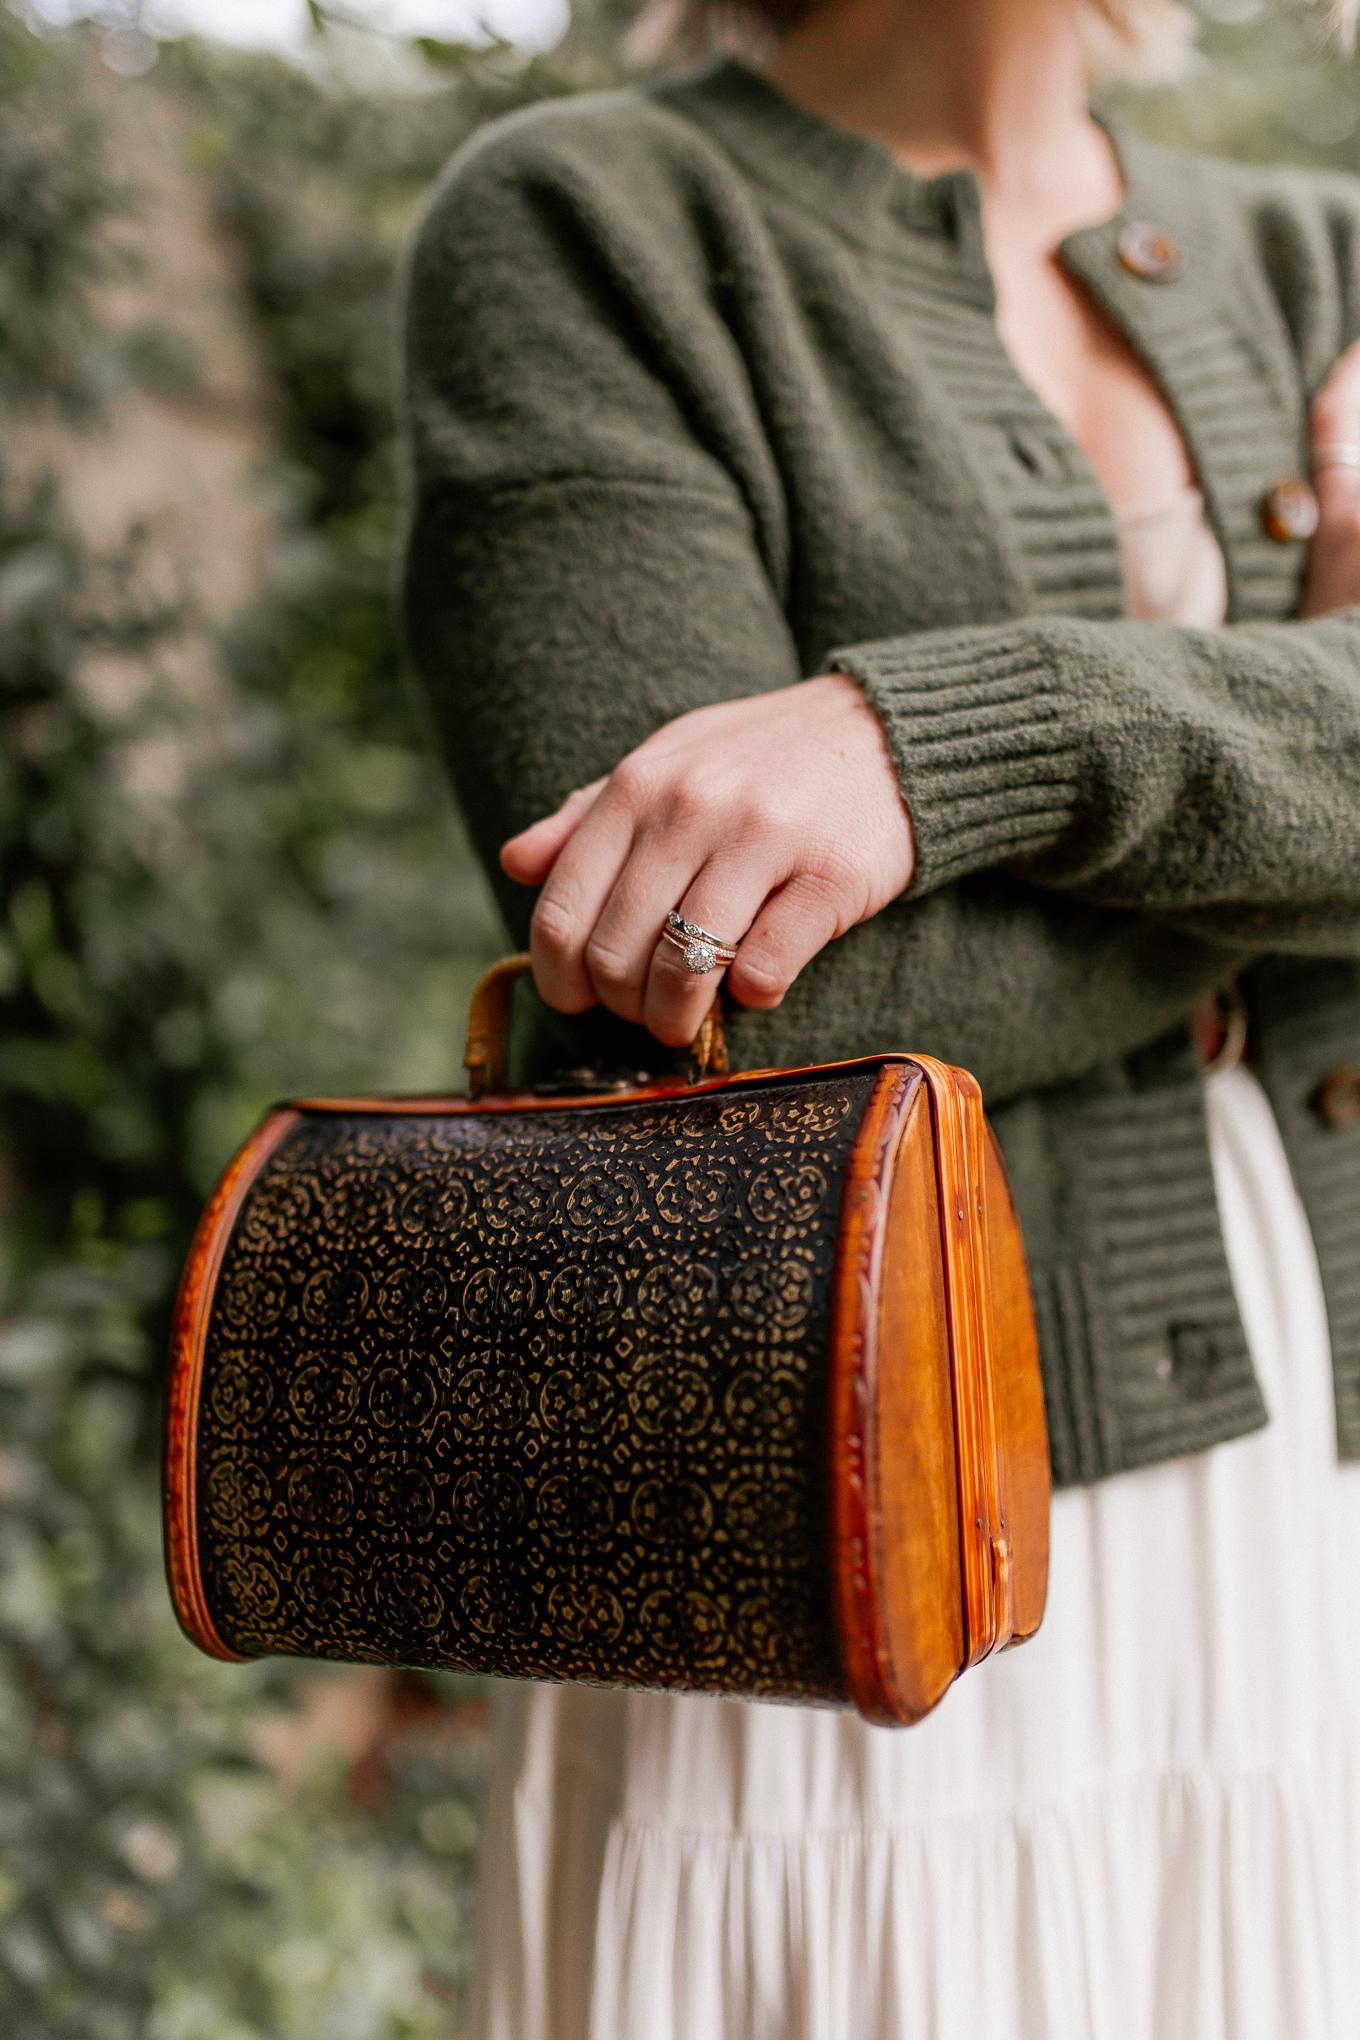 Vintage handbag | Louella Reese